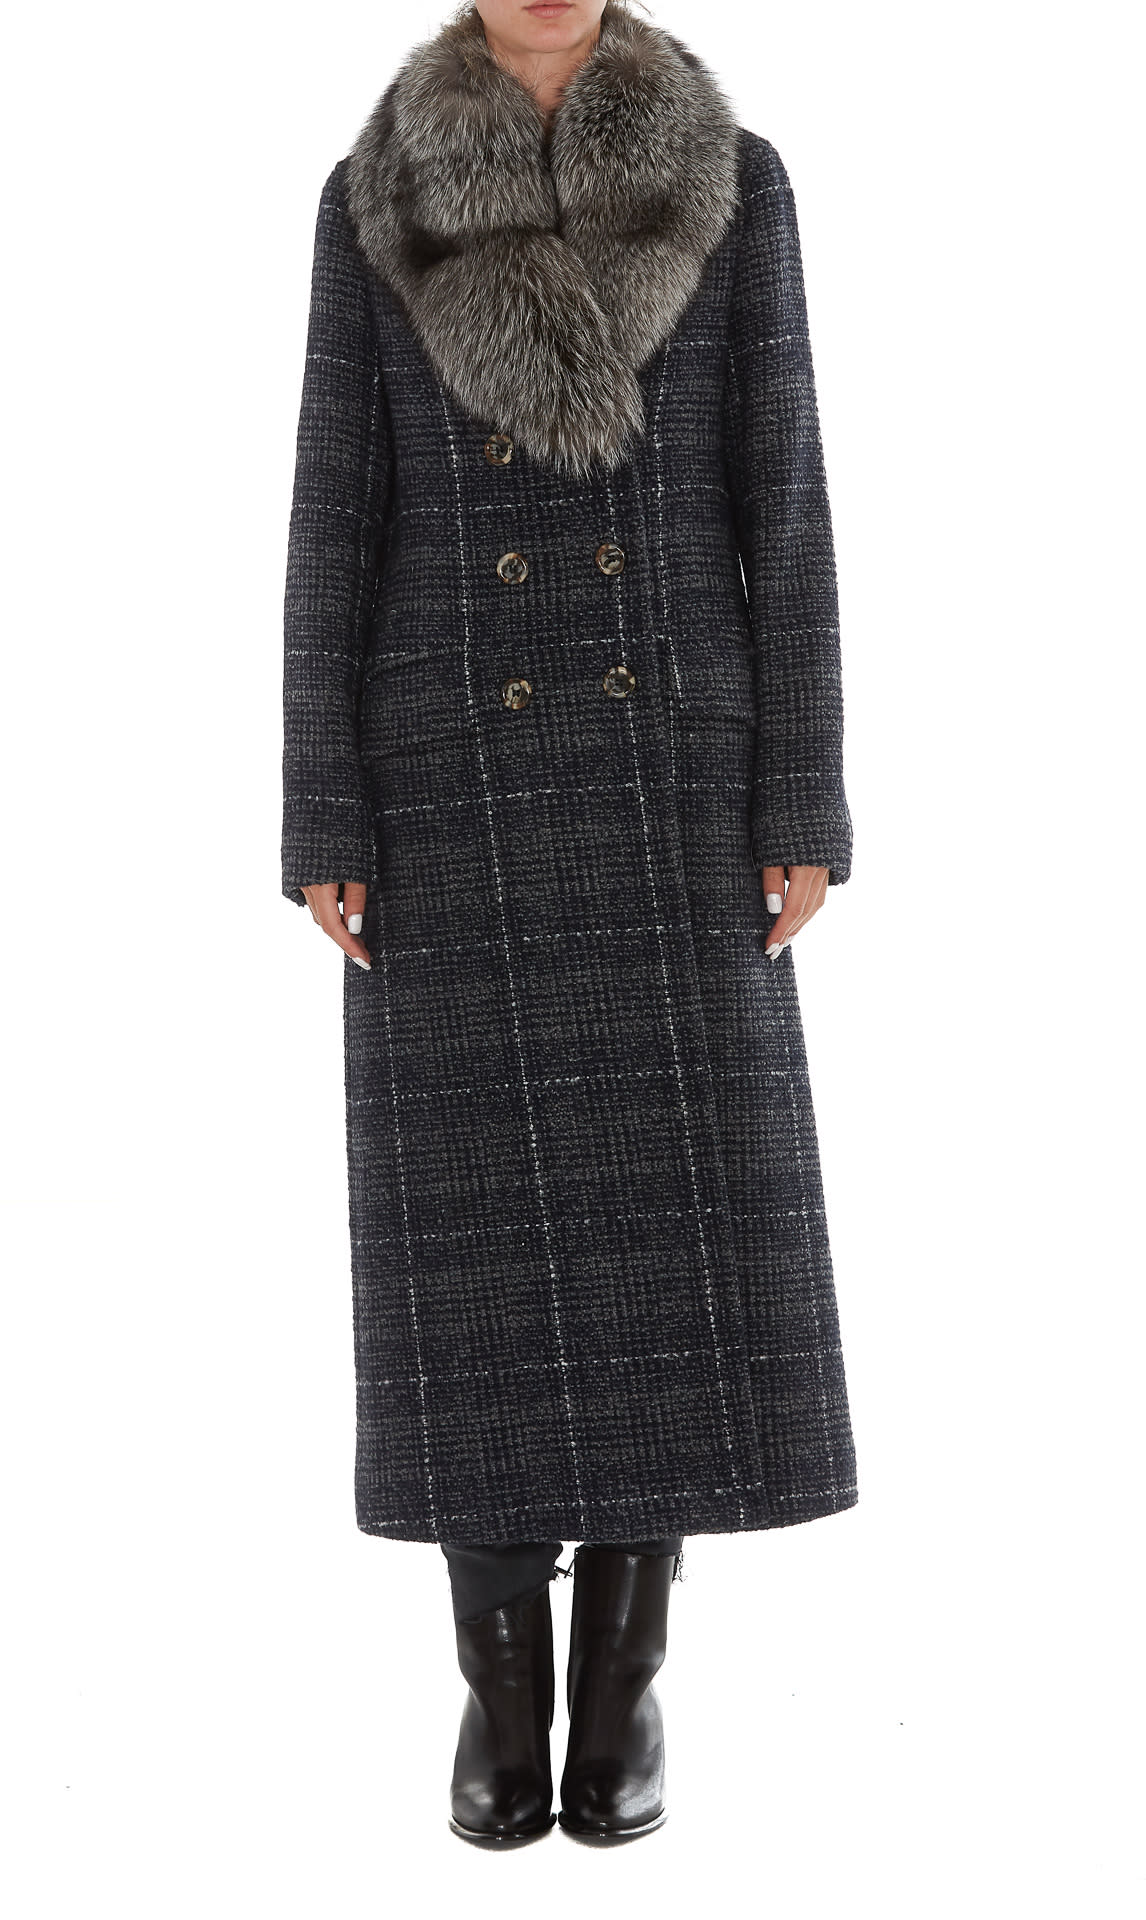 Ida Lou Coat With Fur Collar